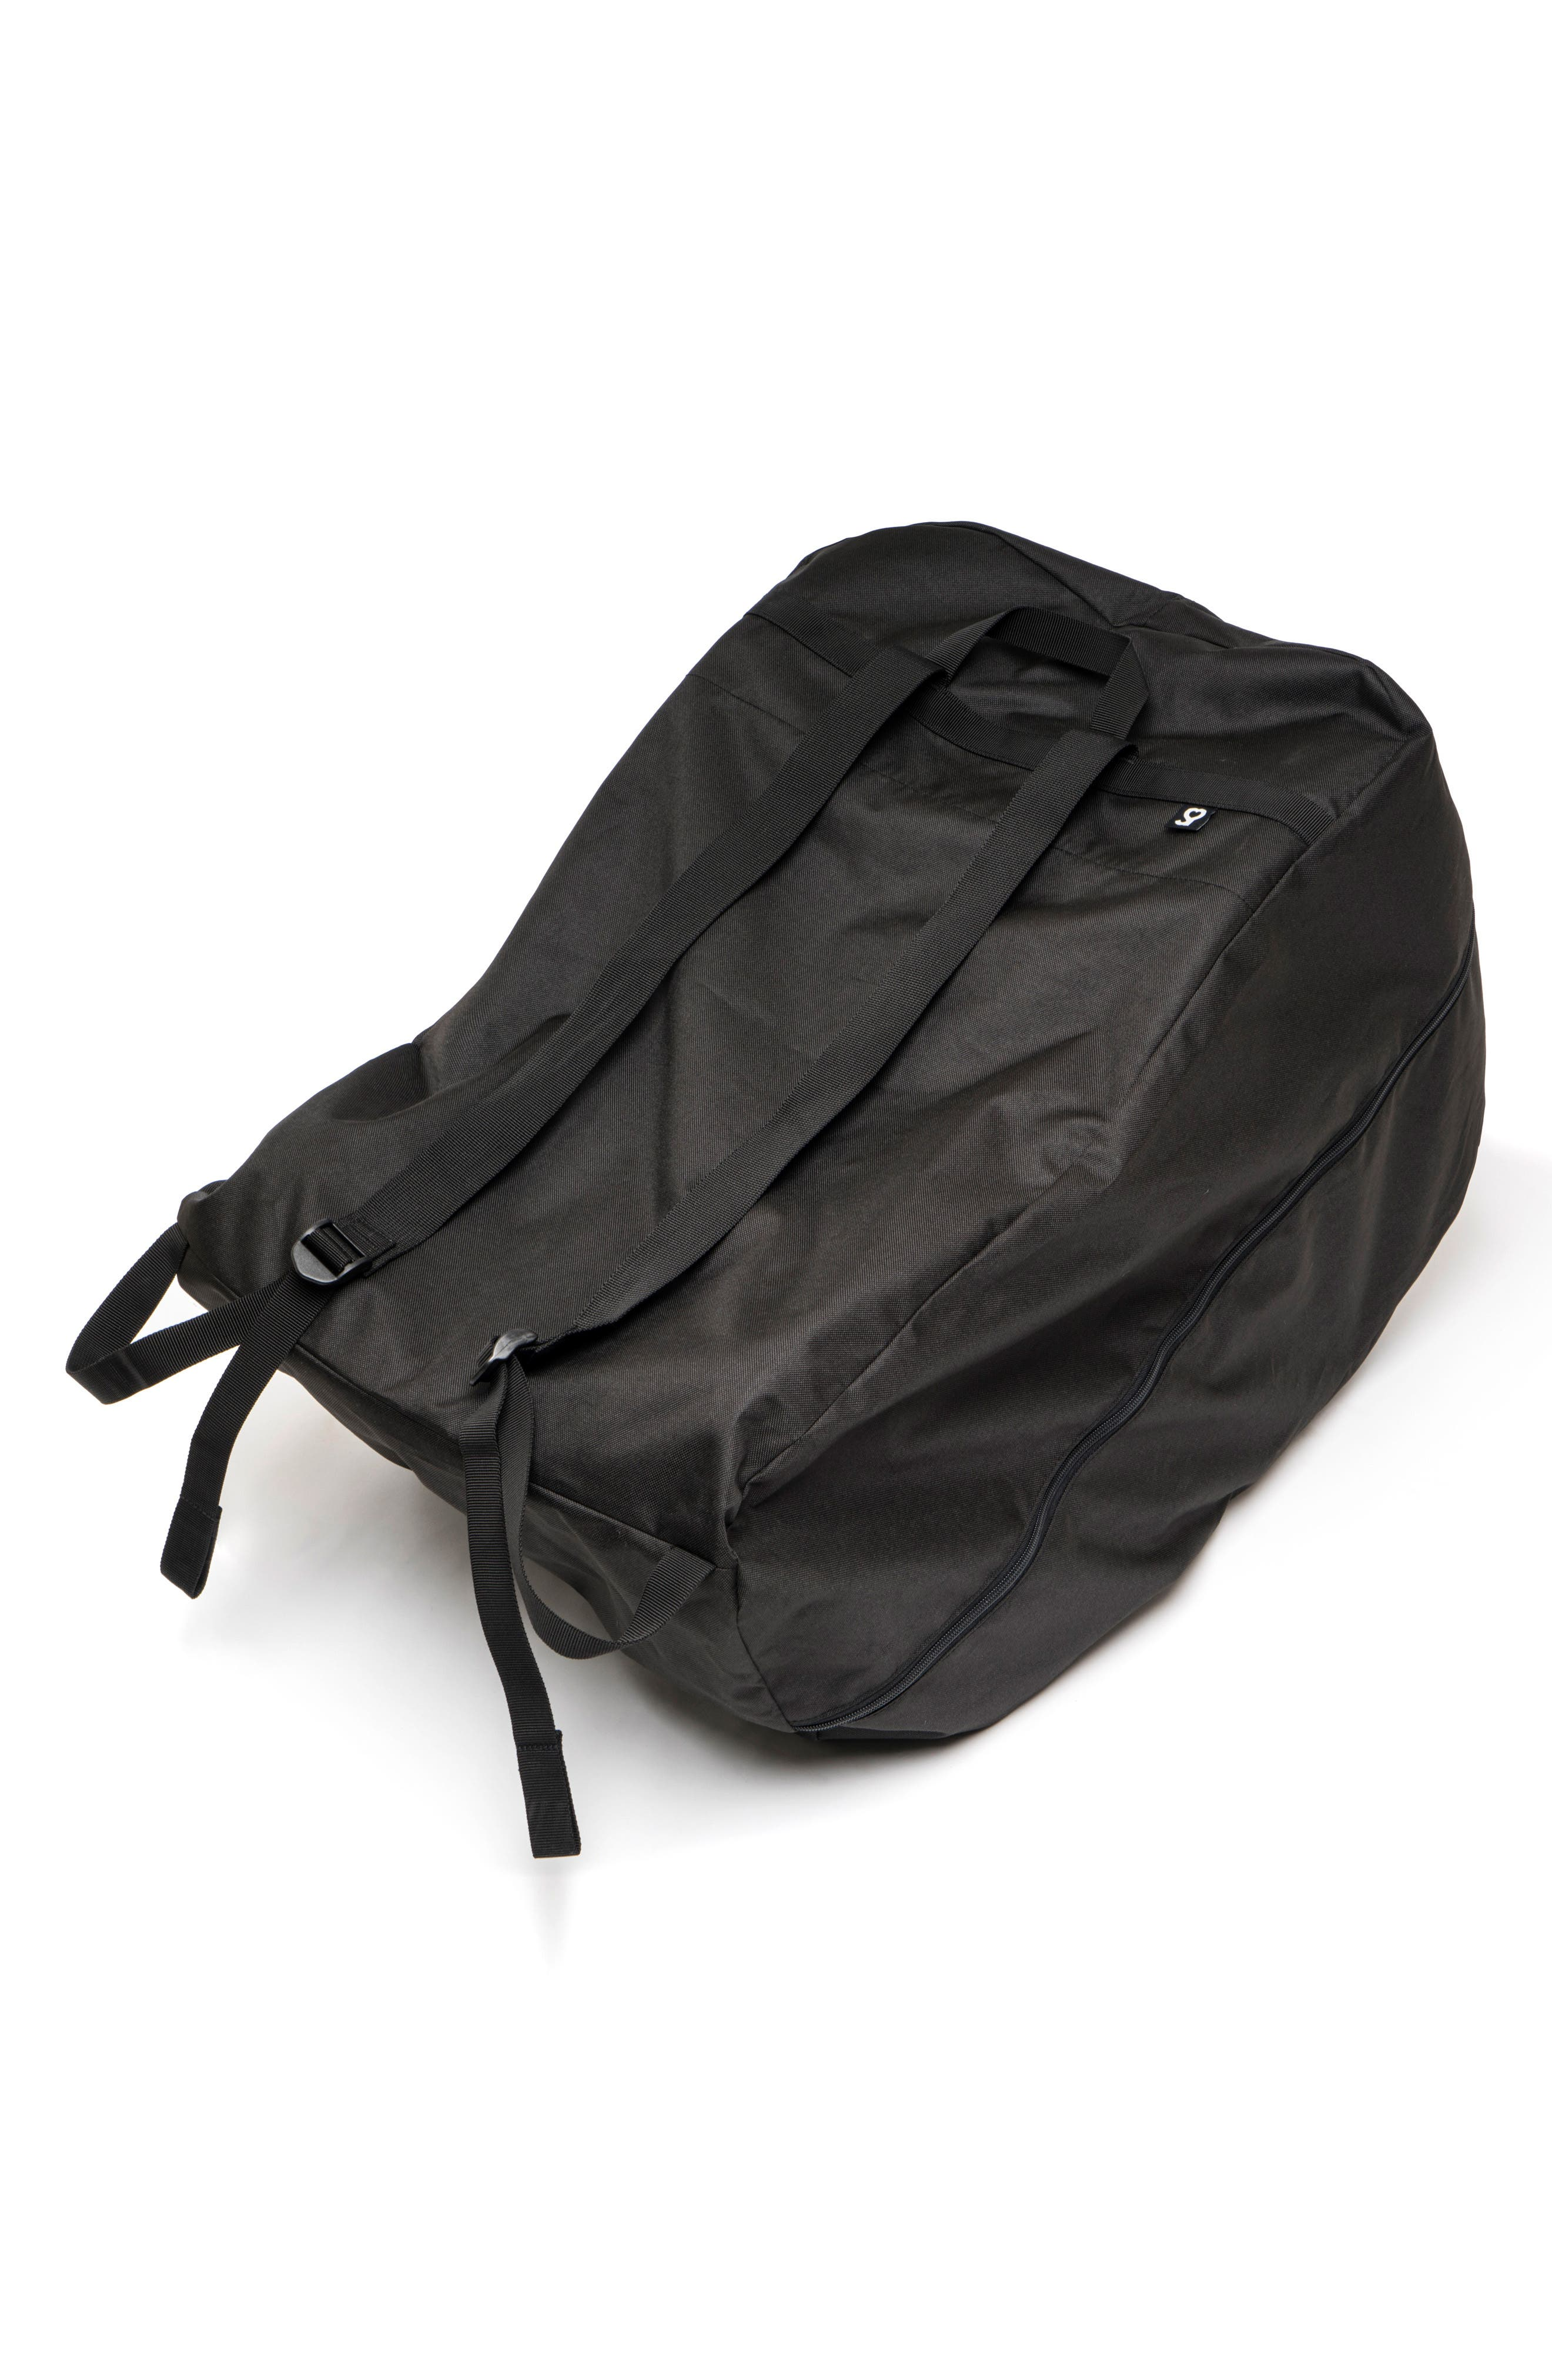 Infant Doona Travel Bag Size One Size  Black